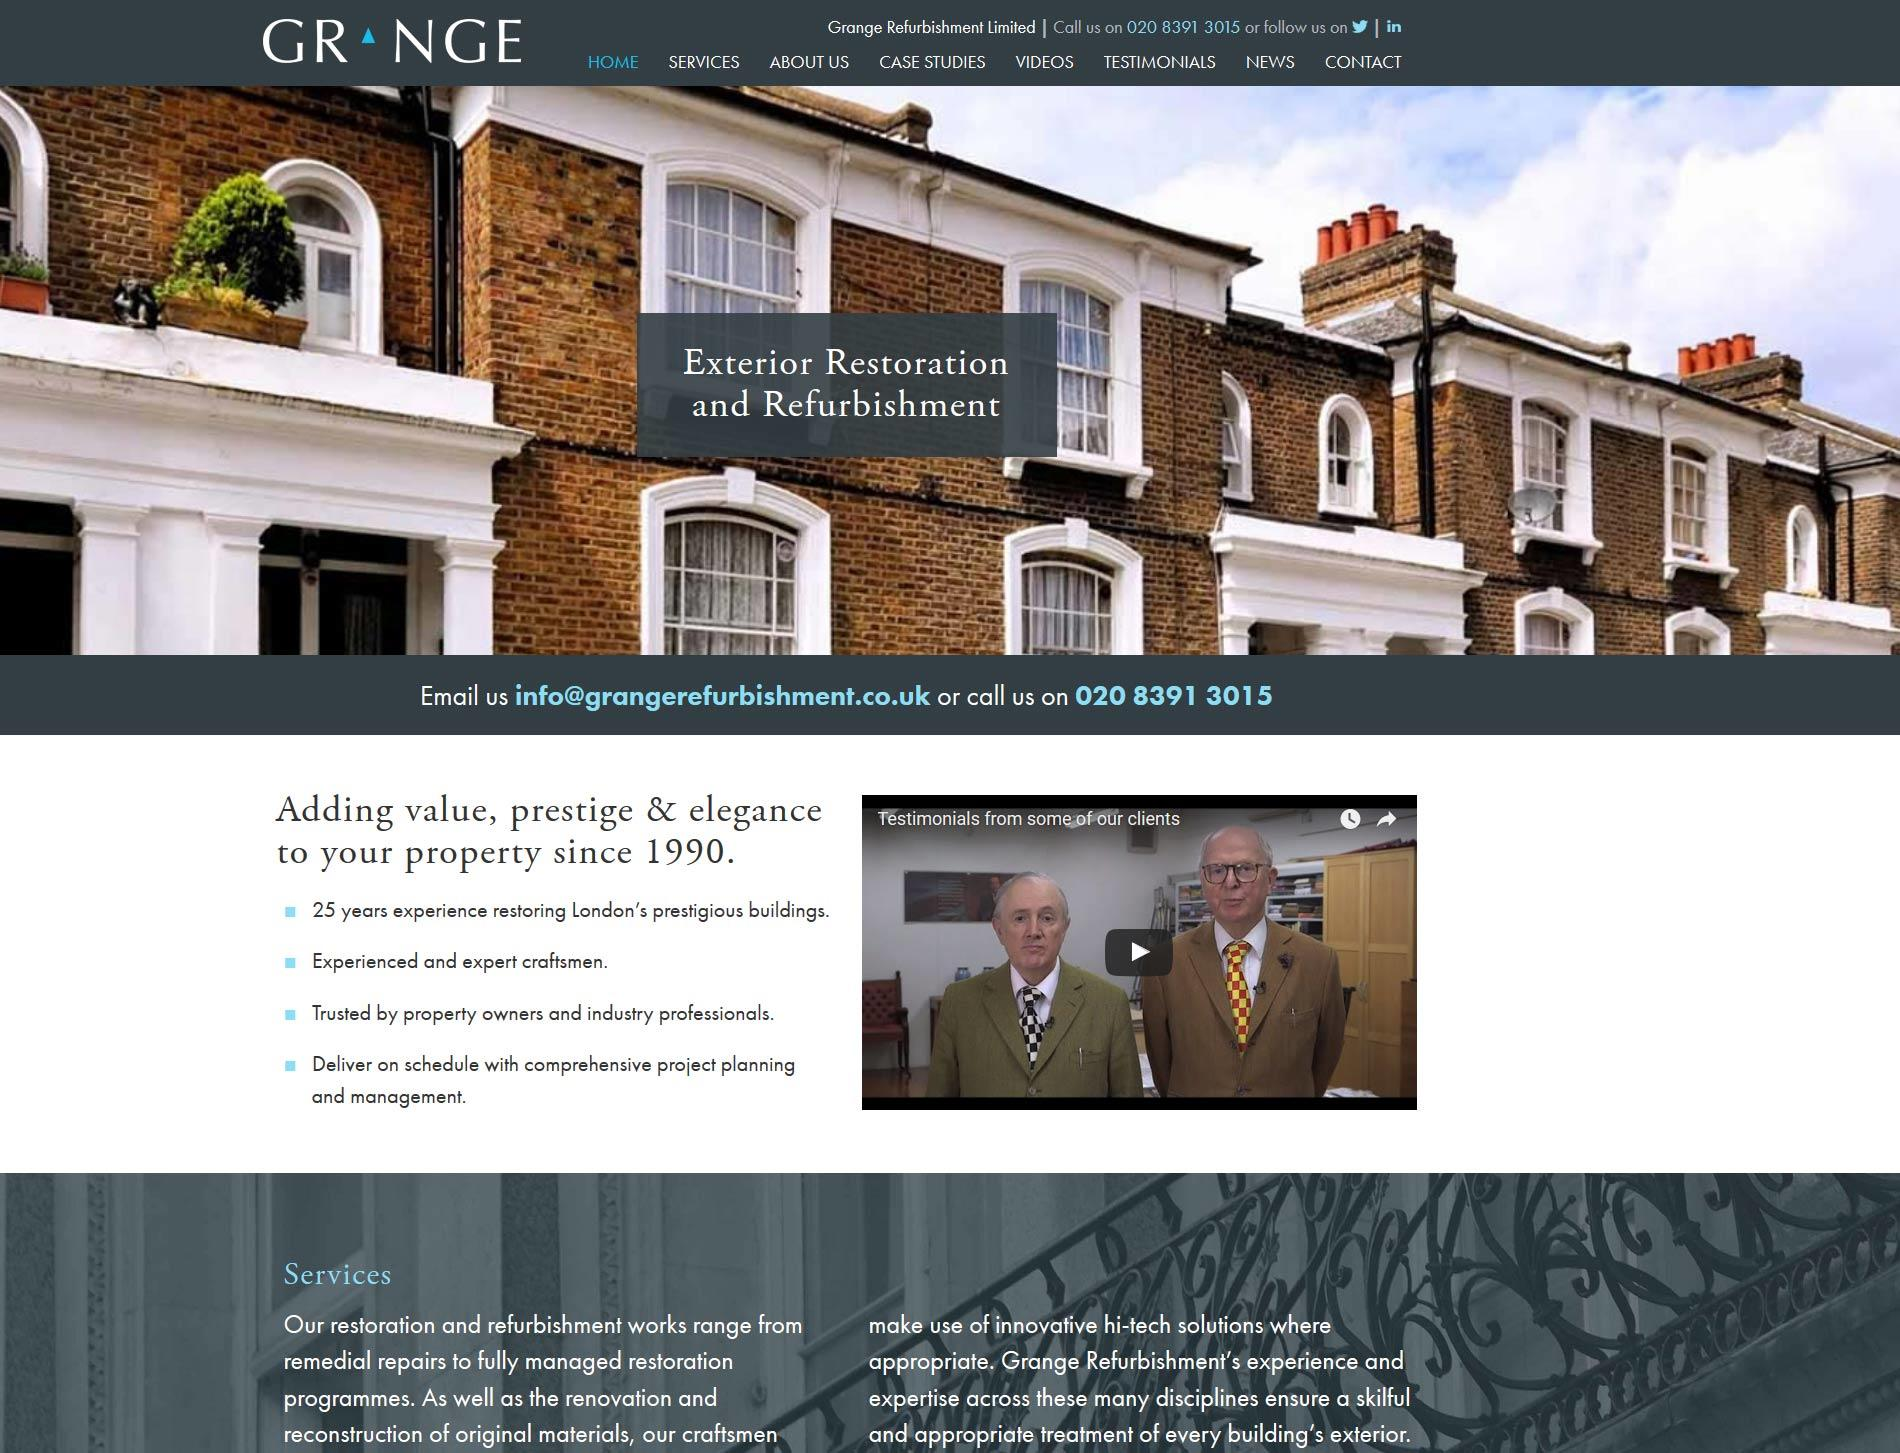 grange refurbishment